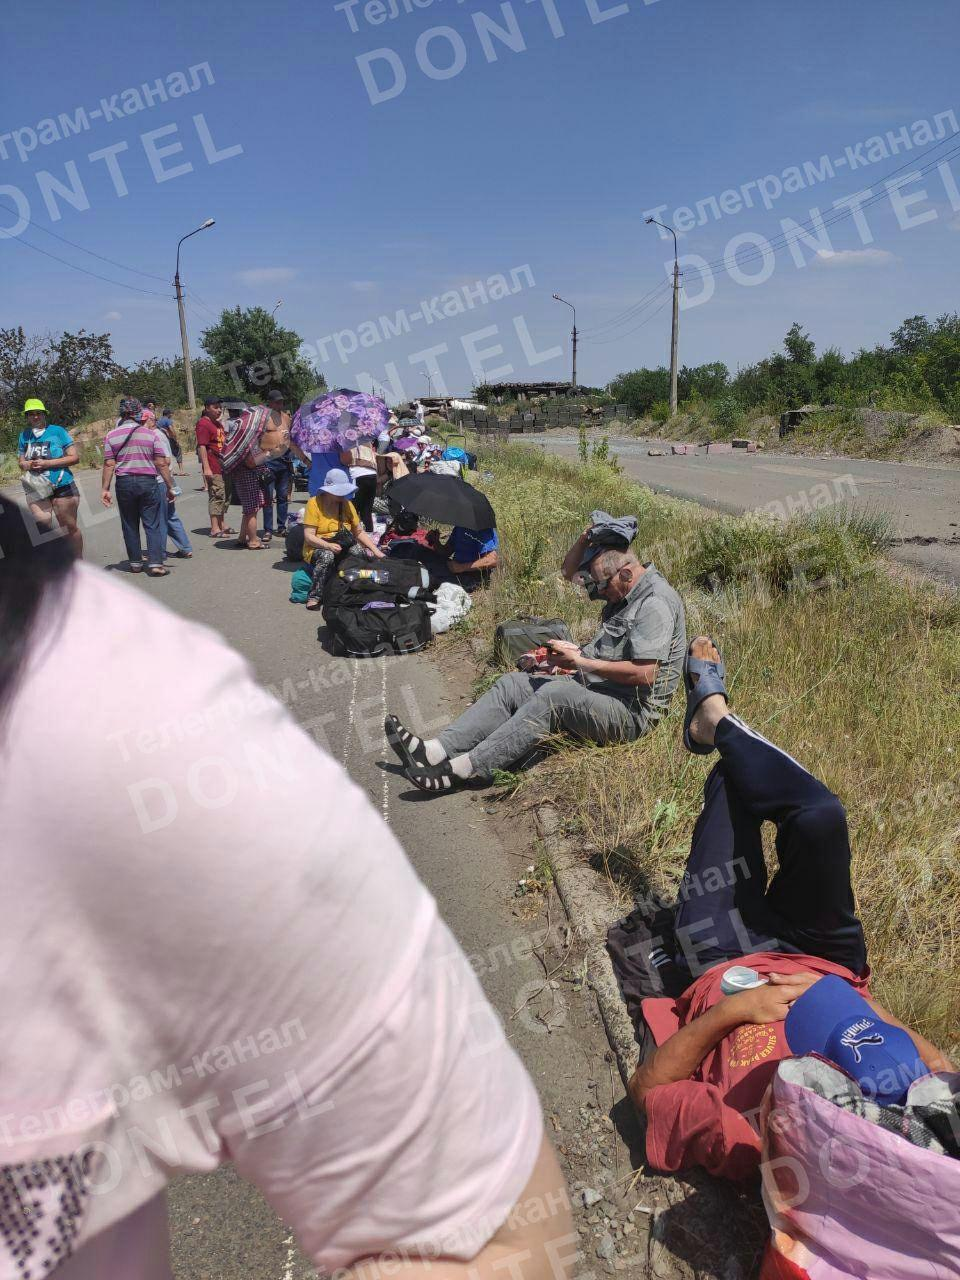 На КПВВ «Еленовка» в «серой зоне» застряли около 100 человек